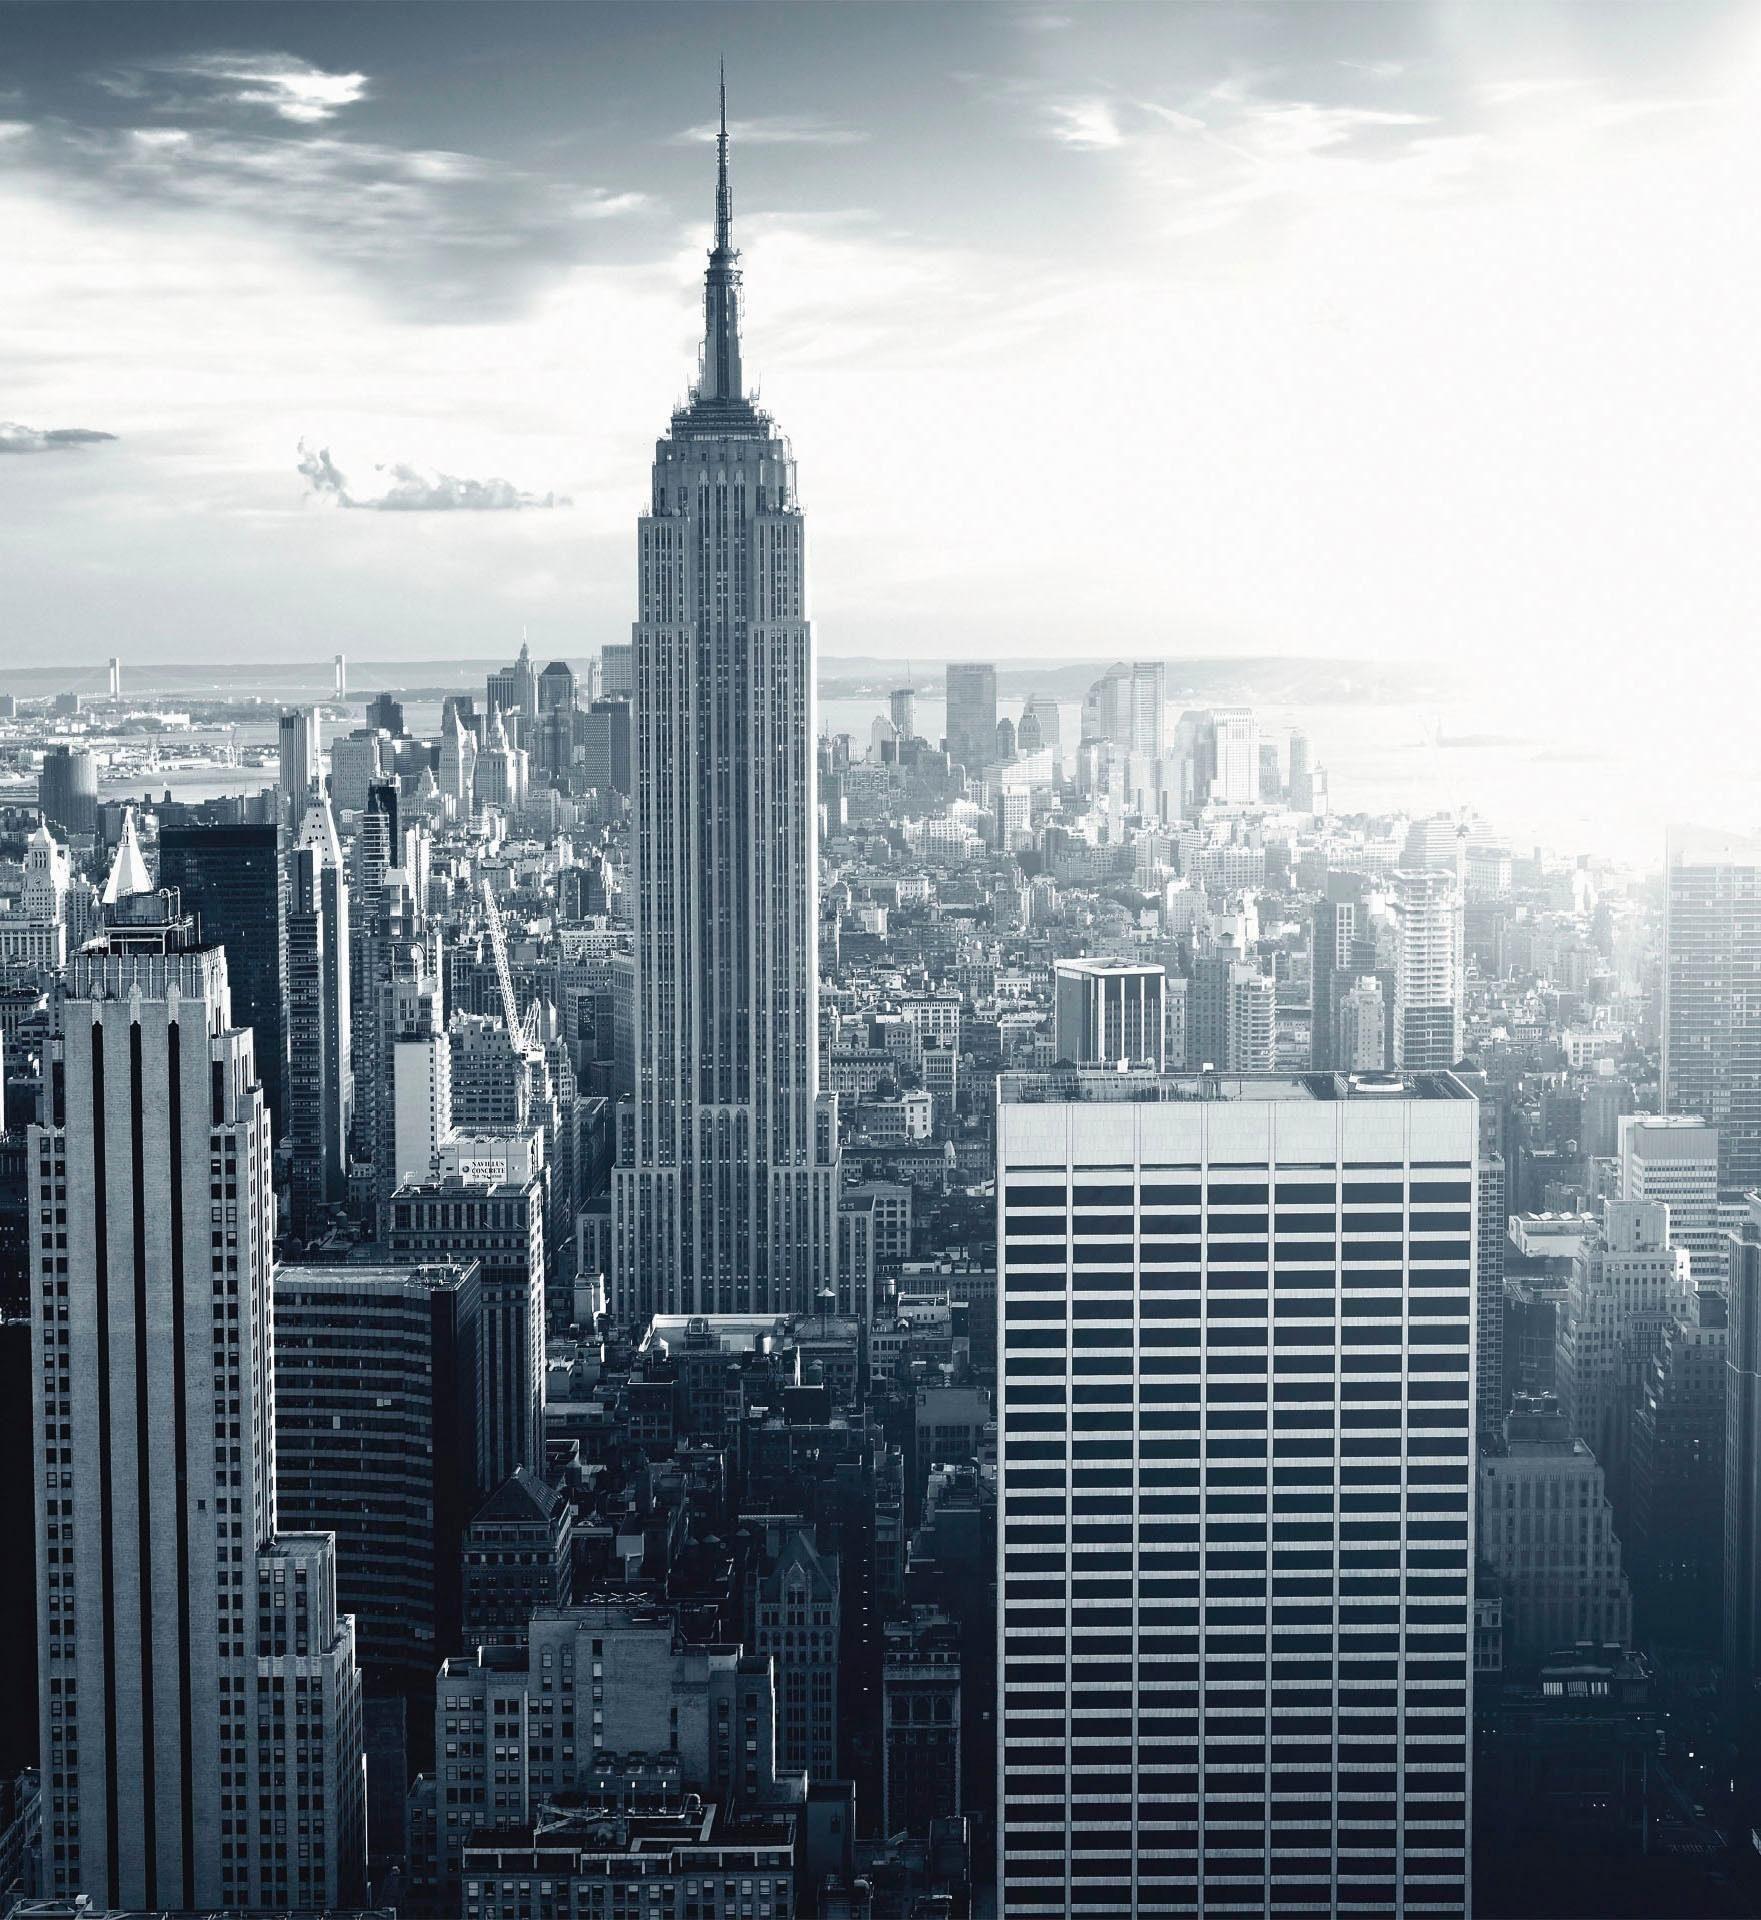 Fototapete »The Empire State Building« 240/260 cm